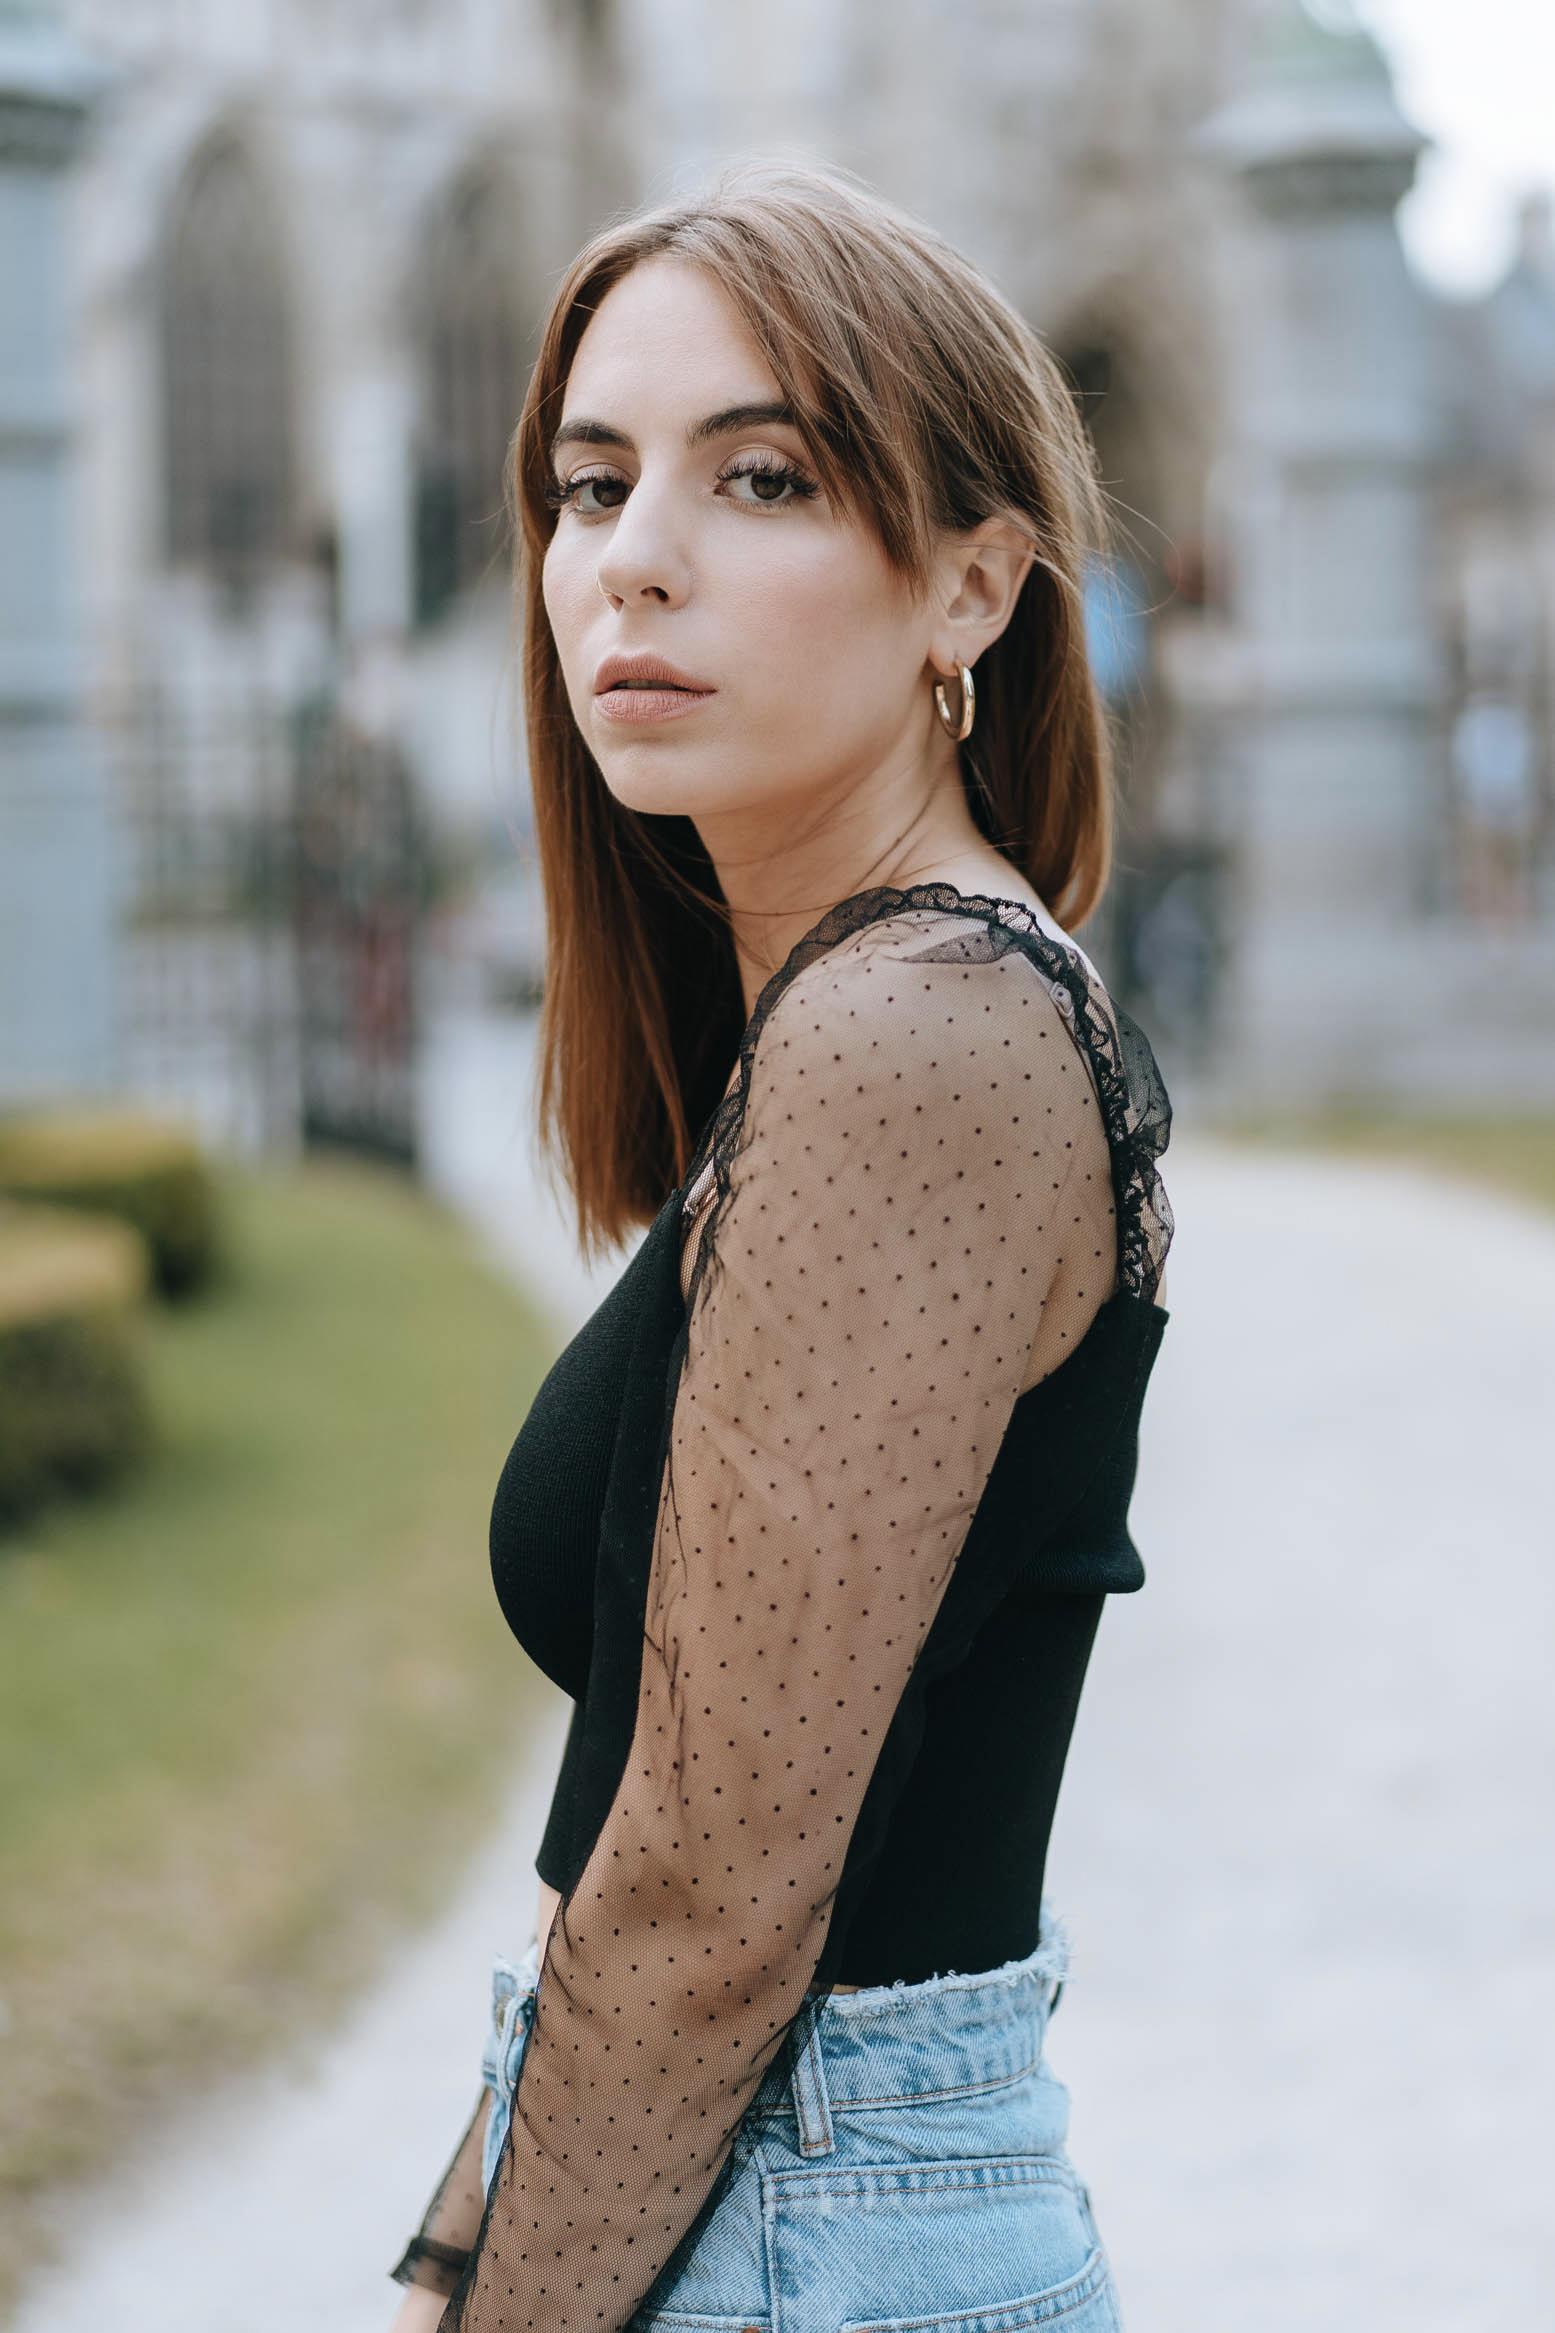 photographe-Bruxelles-shooting-portrait-nicolasleleu-19.jpg